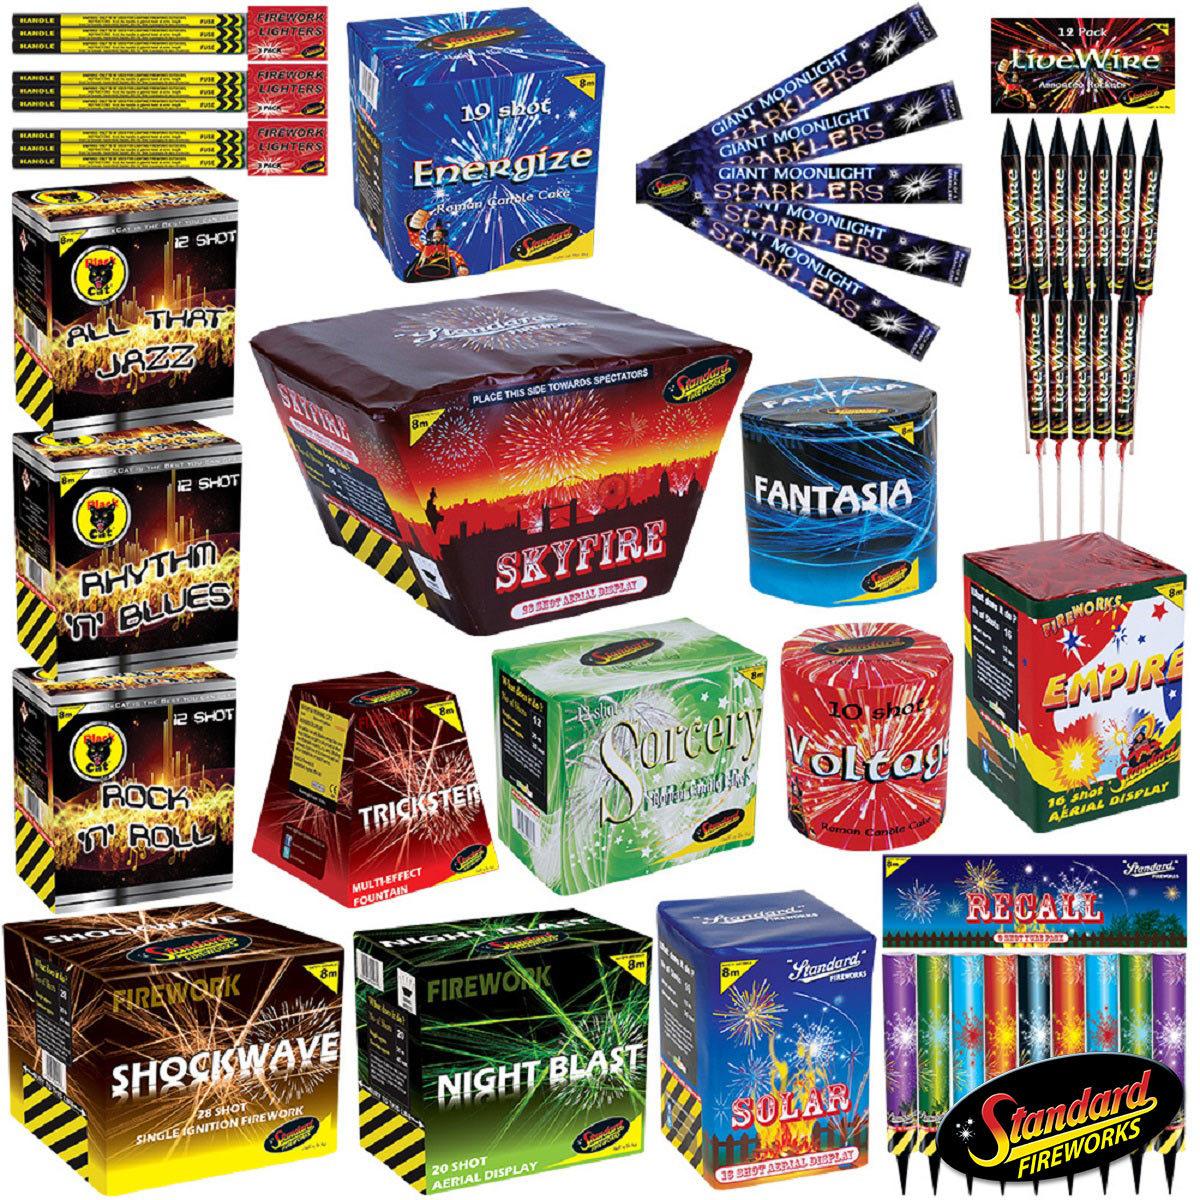 Big Boss, Compound Firework, Single Ignition Firework, - Mafia Gangster  Mobster Painting Art 32x24 Print Poster PNG Image | Transparent PNG Free  Download on SeekPNG